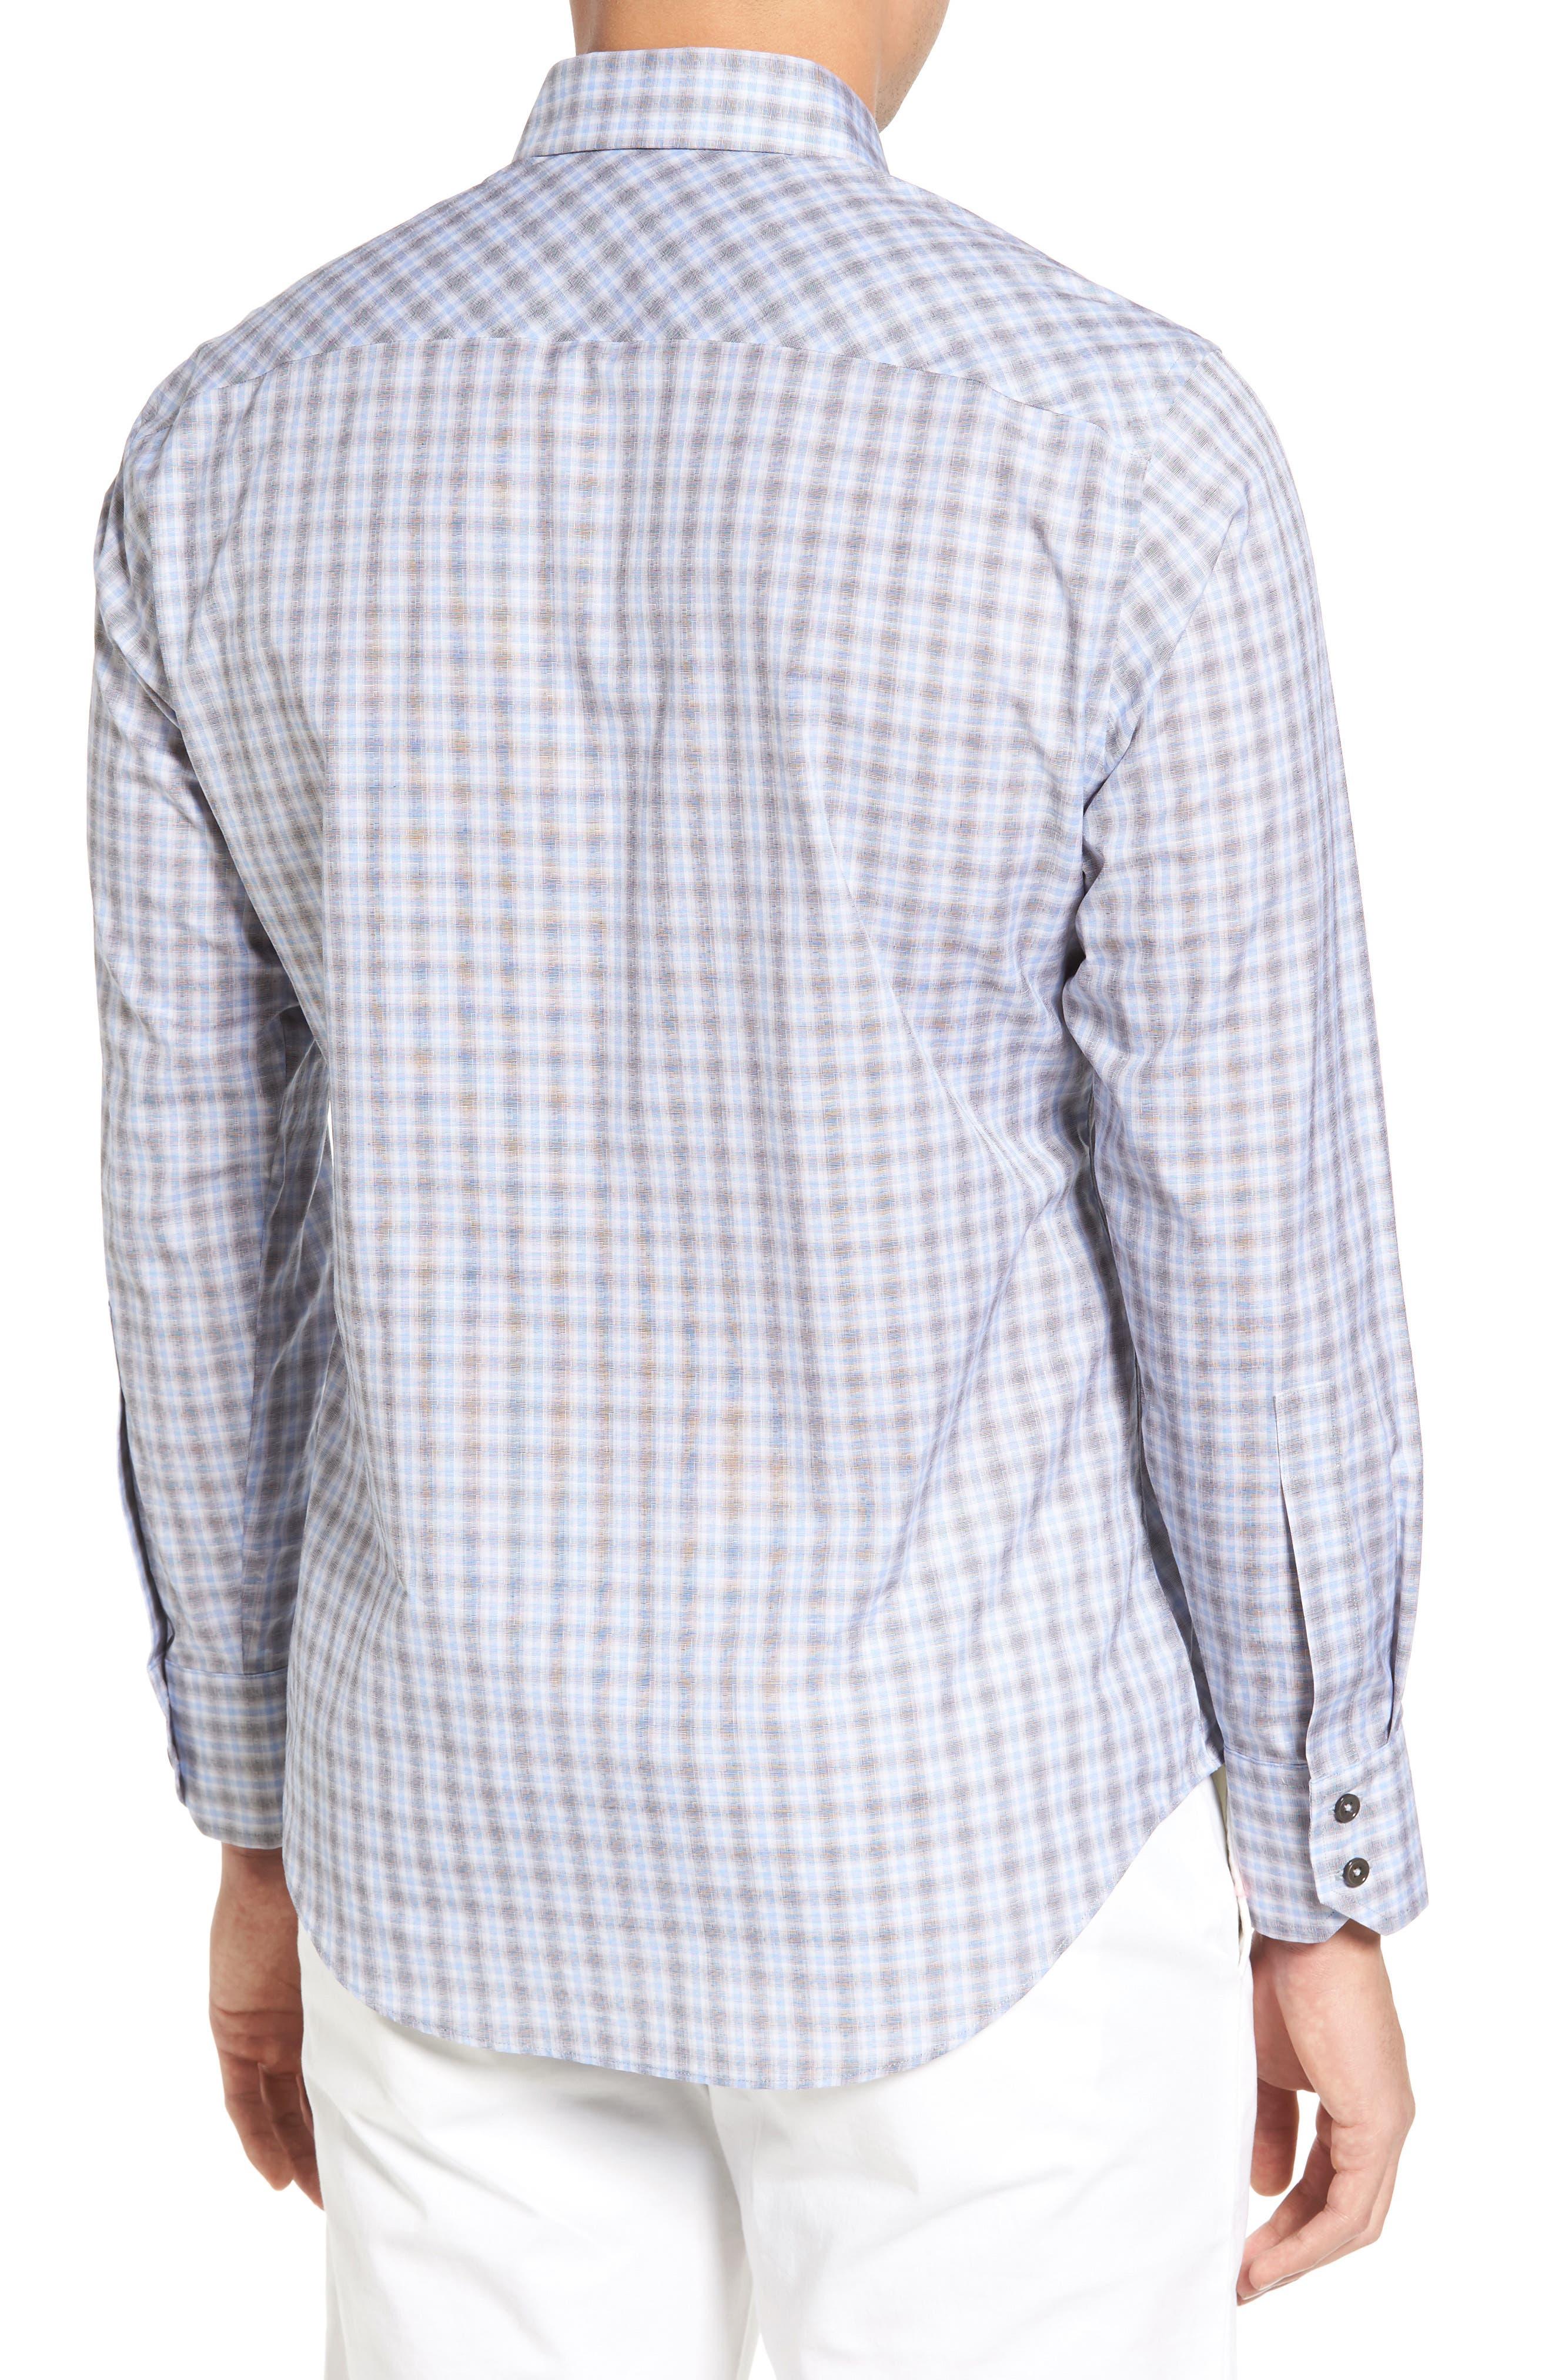 Cristiano Trim Fit Plaid Sport Shirt,                             Alternate thumbnail 2, color,                             020